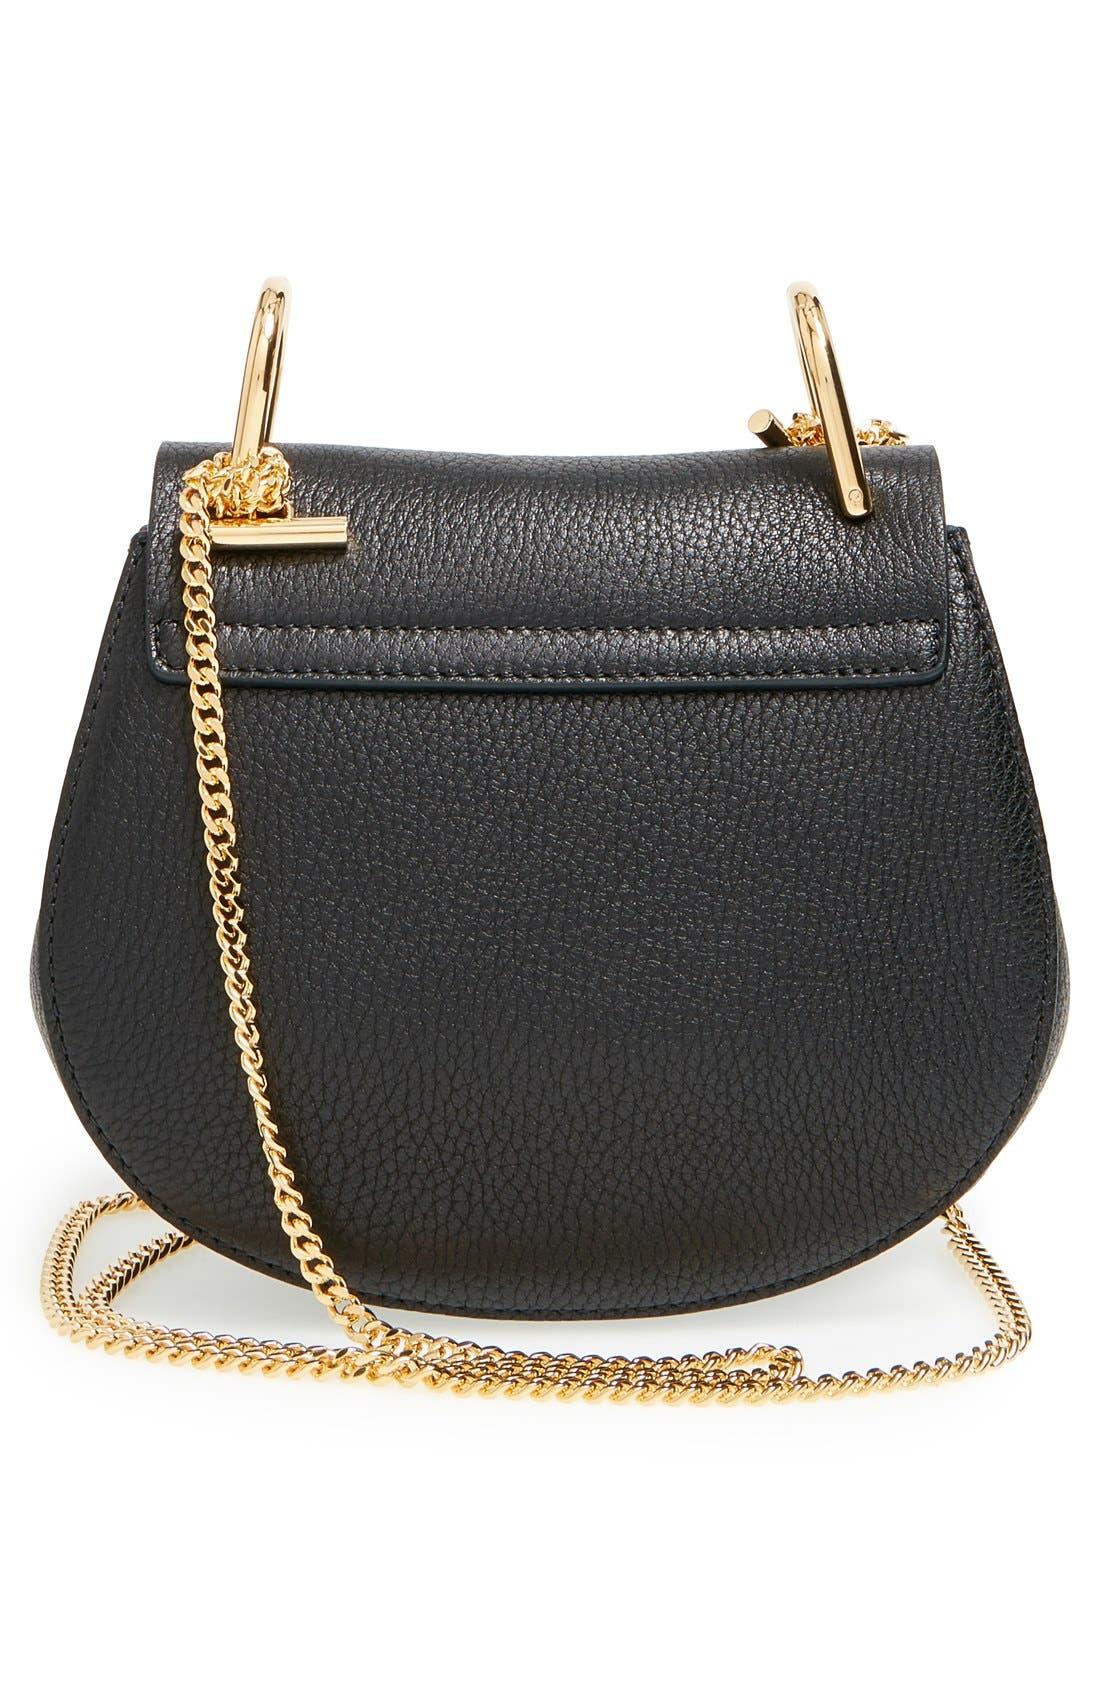 Alternate Image 3  - Chloé 'Mini Drew' Leather Shoulder Bag